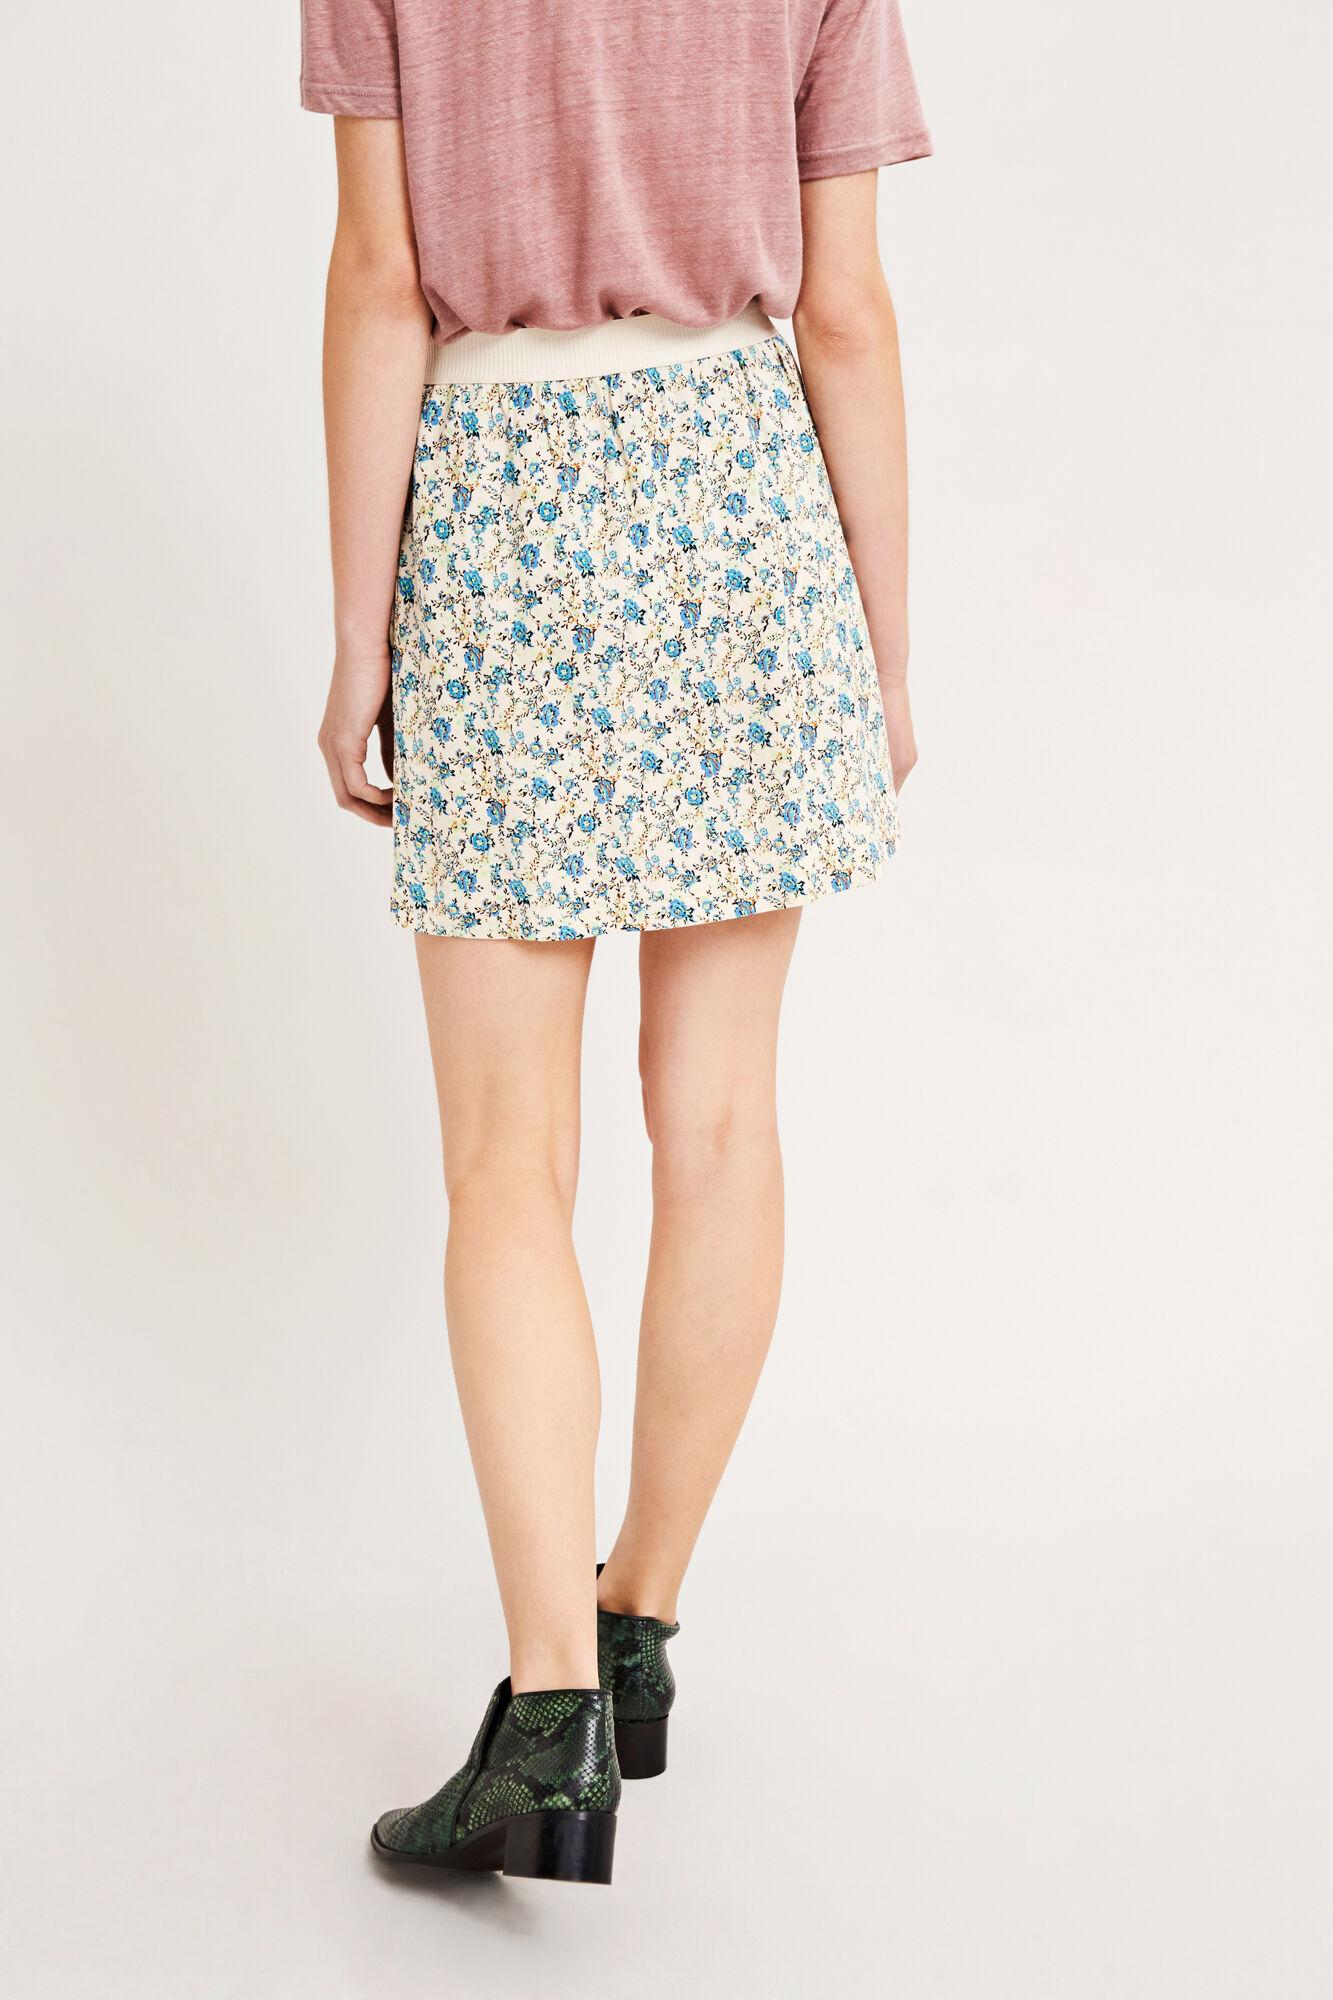 Nessie skirt aop 6515